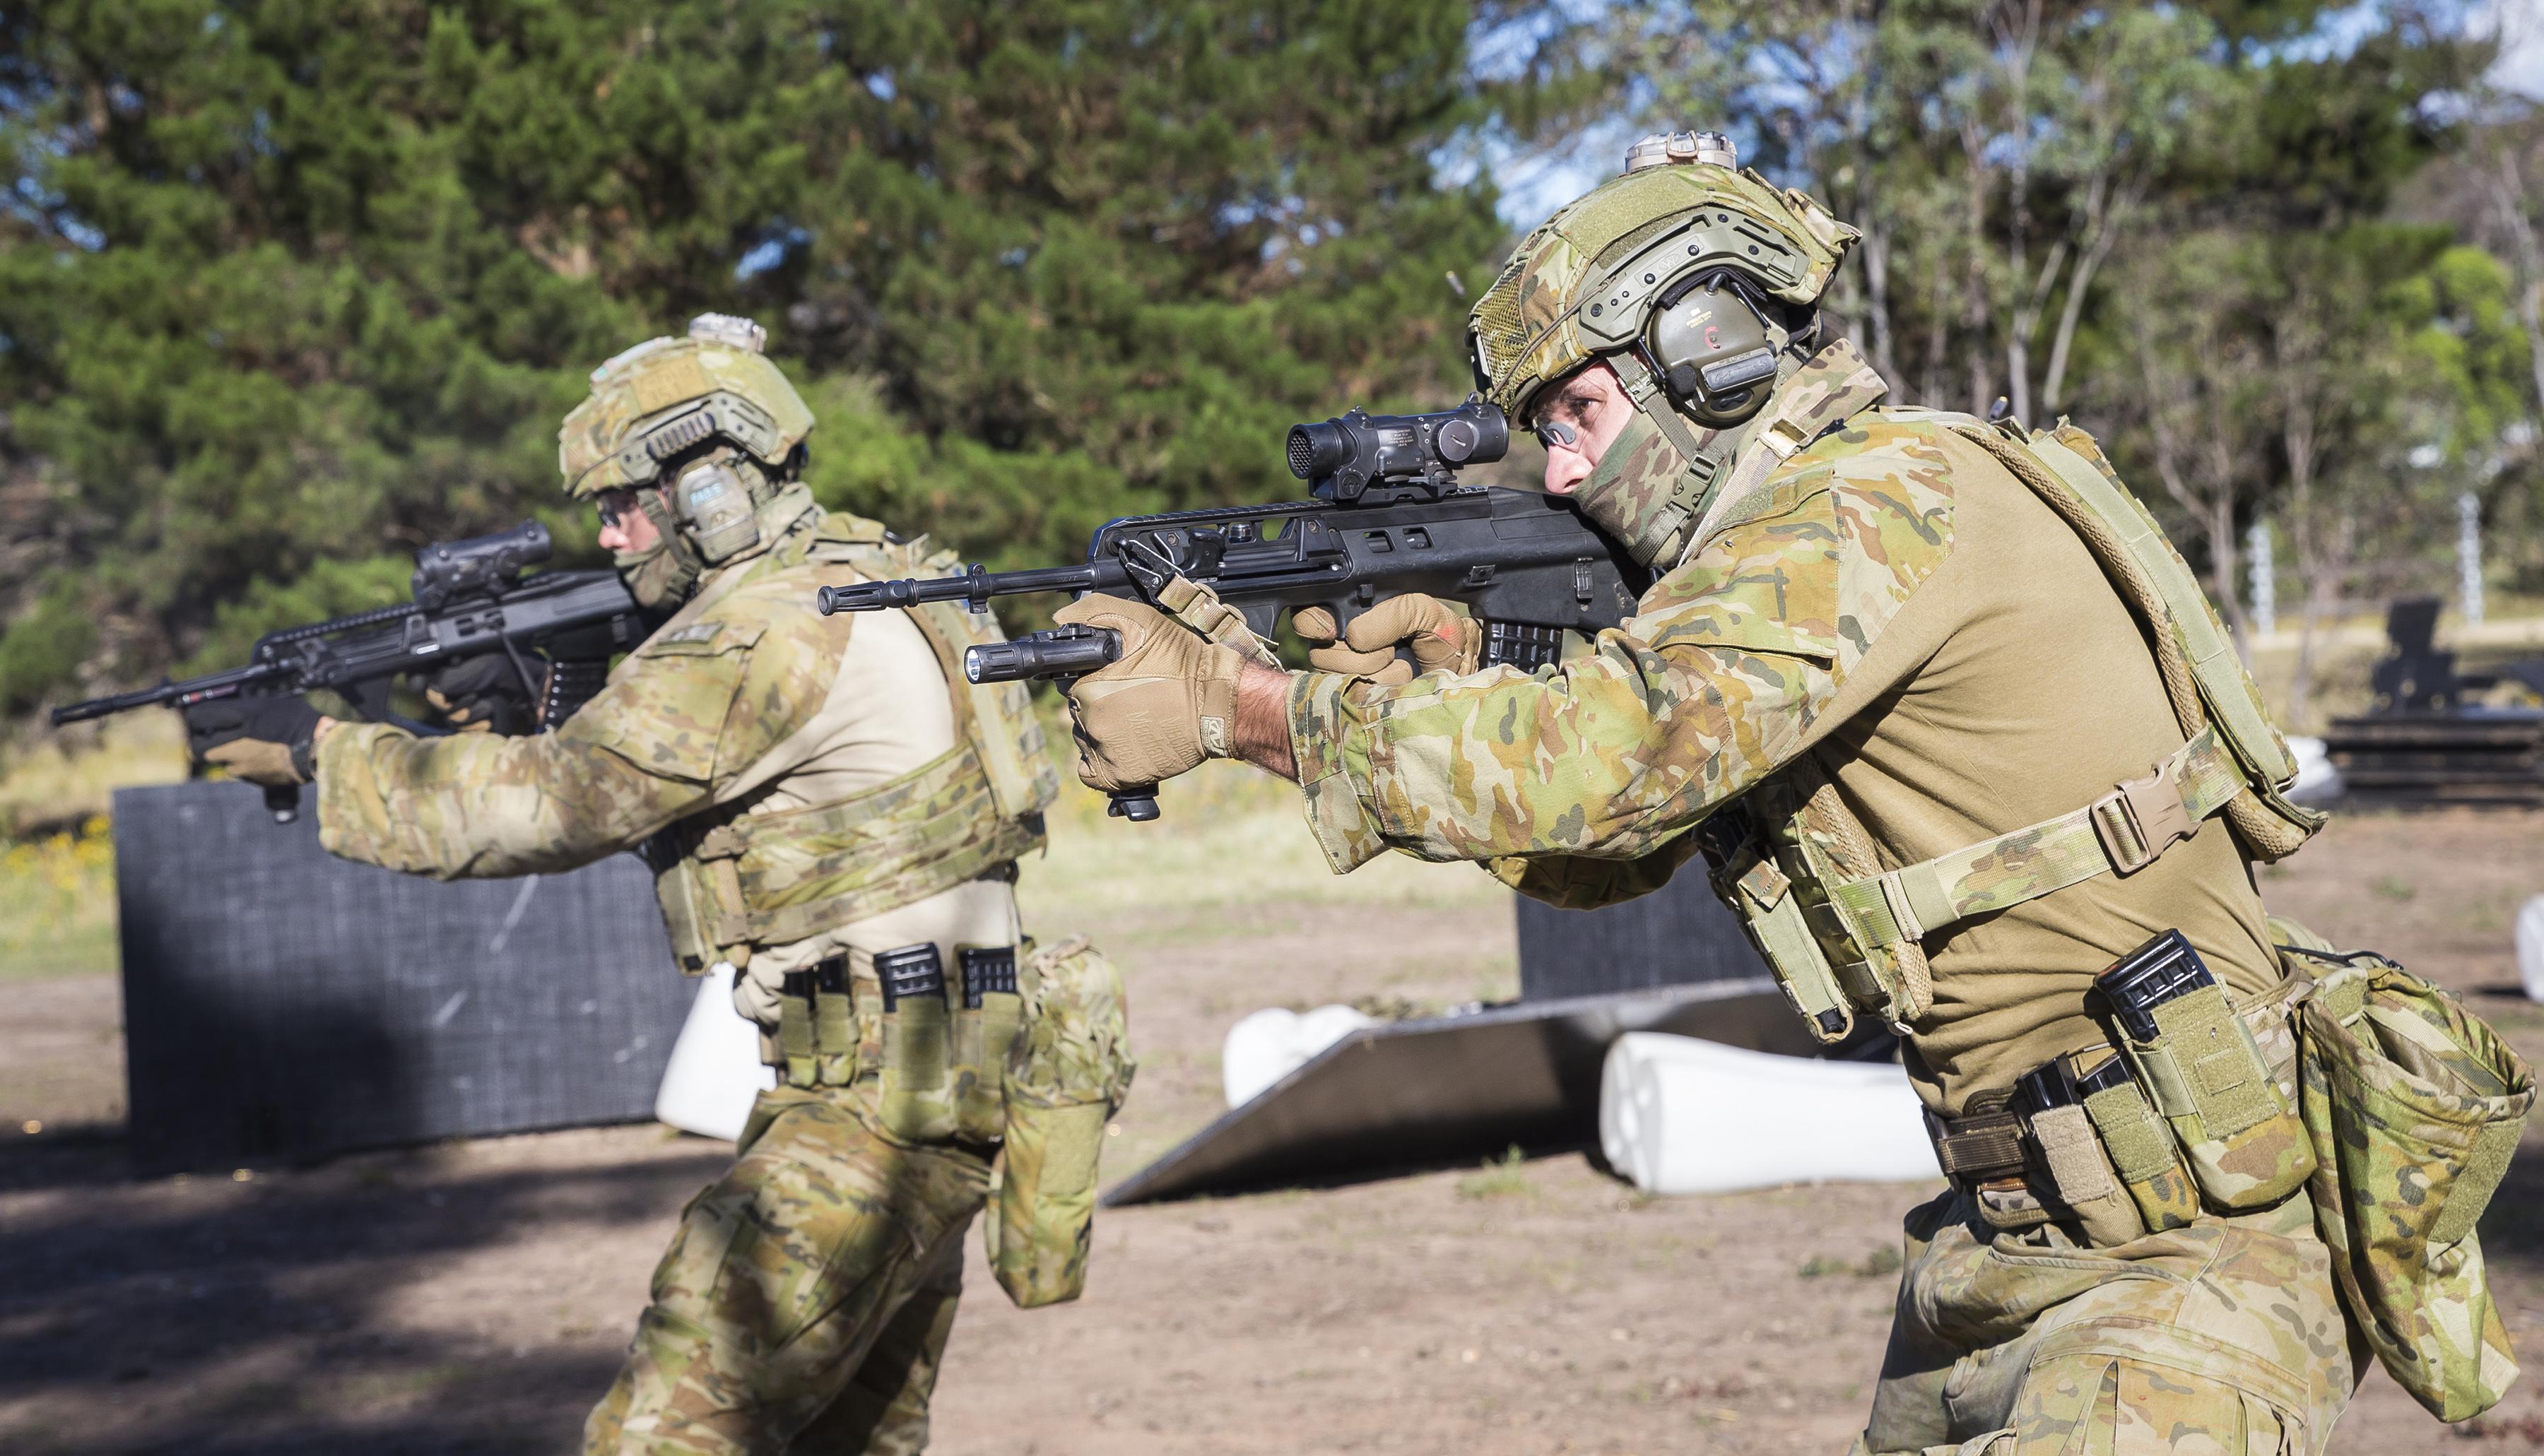 Australia's SAS regiment